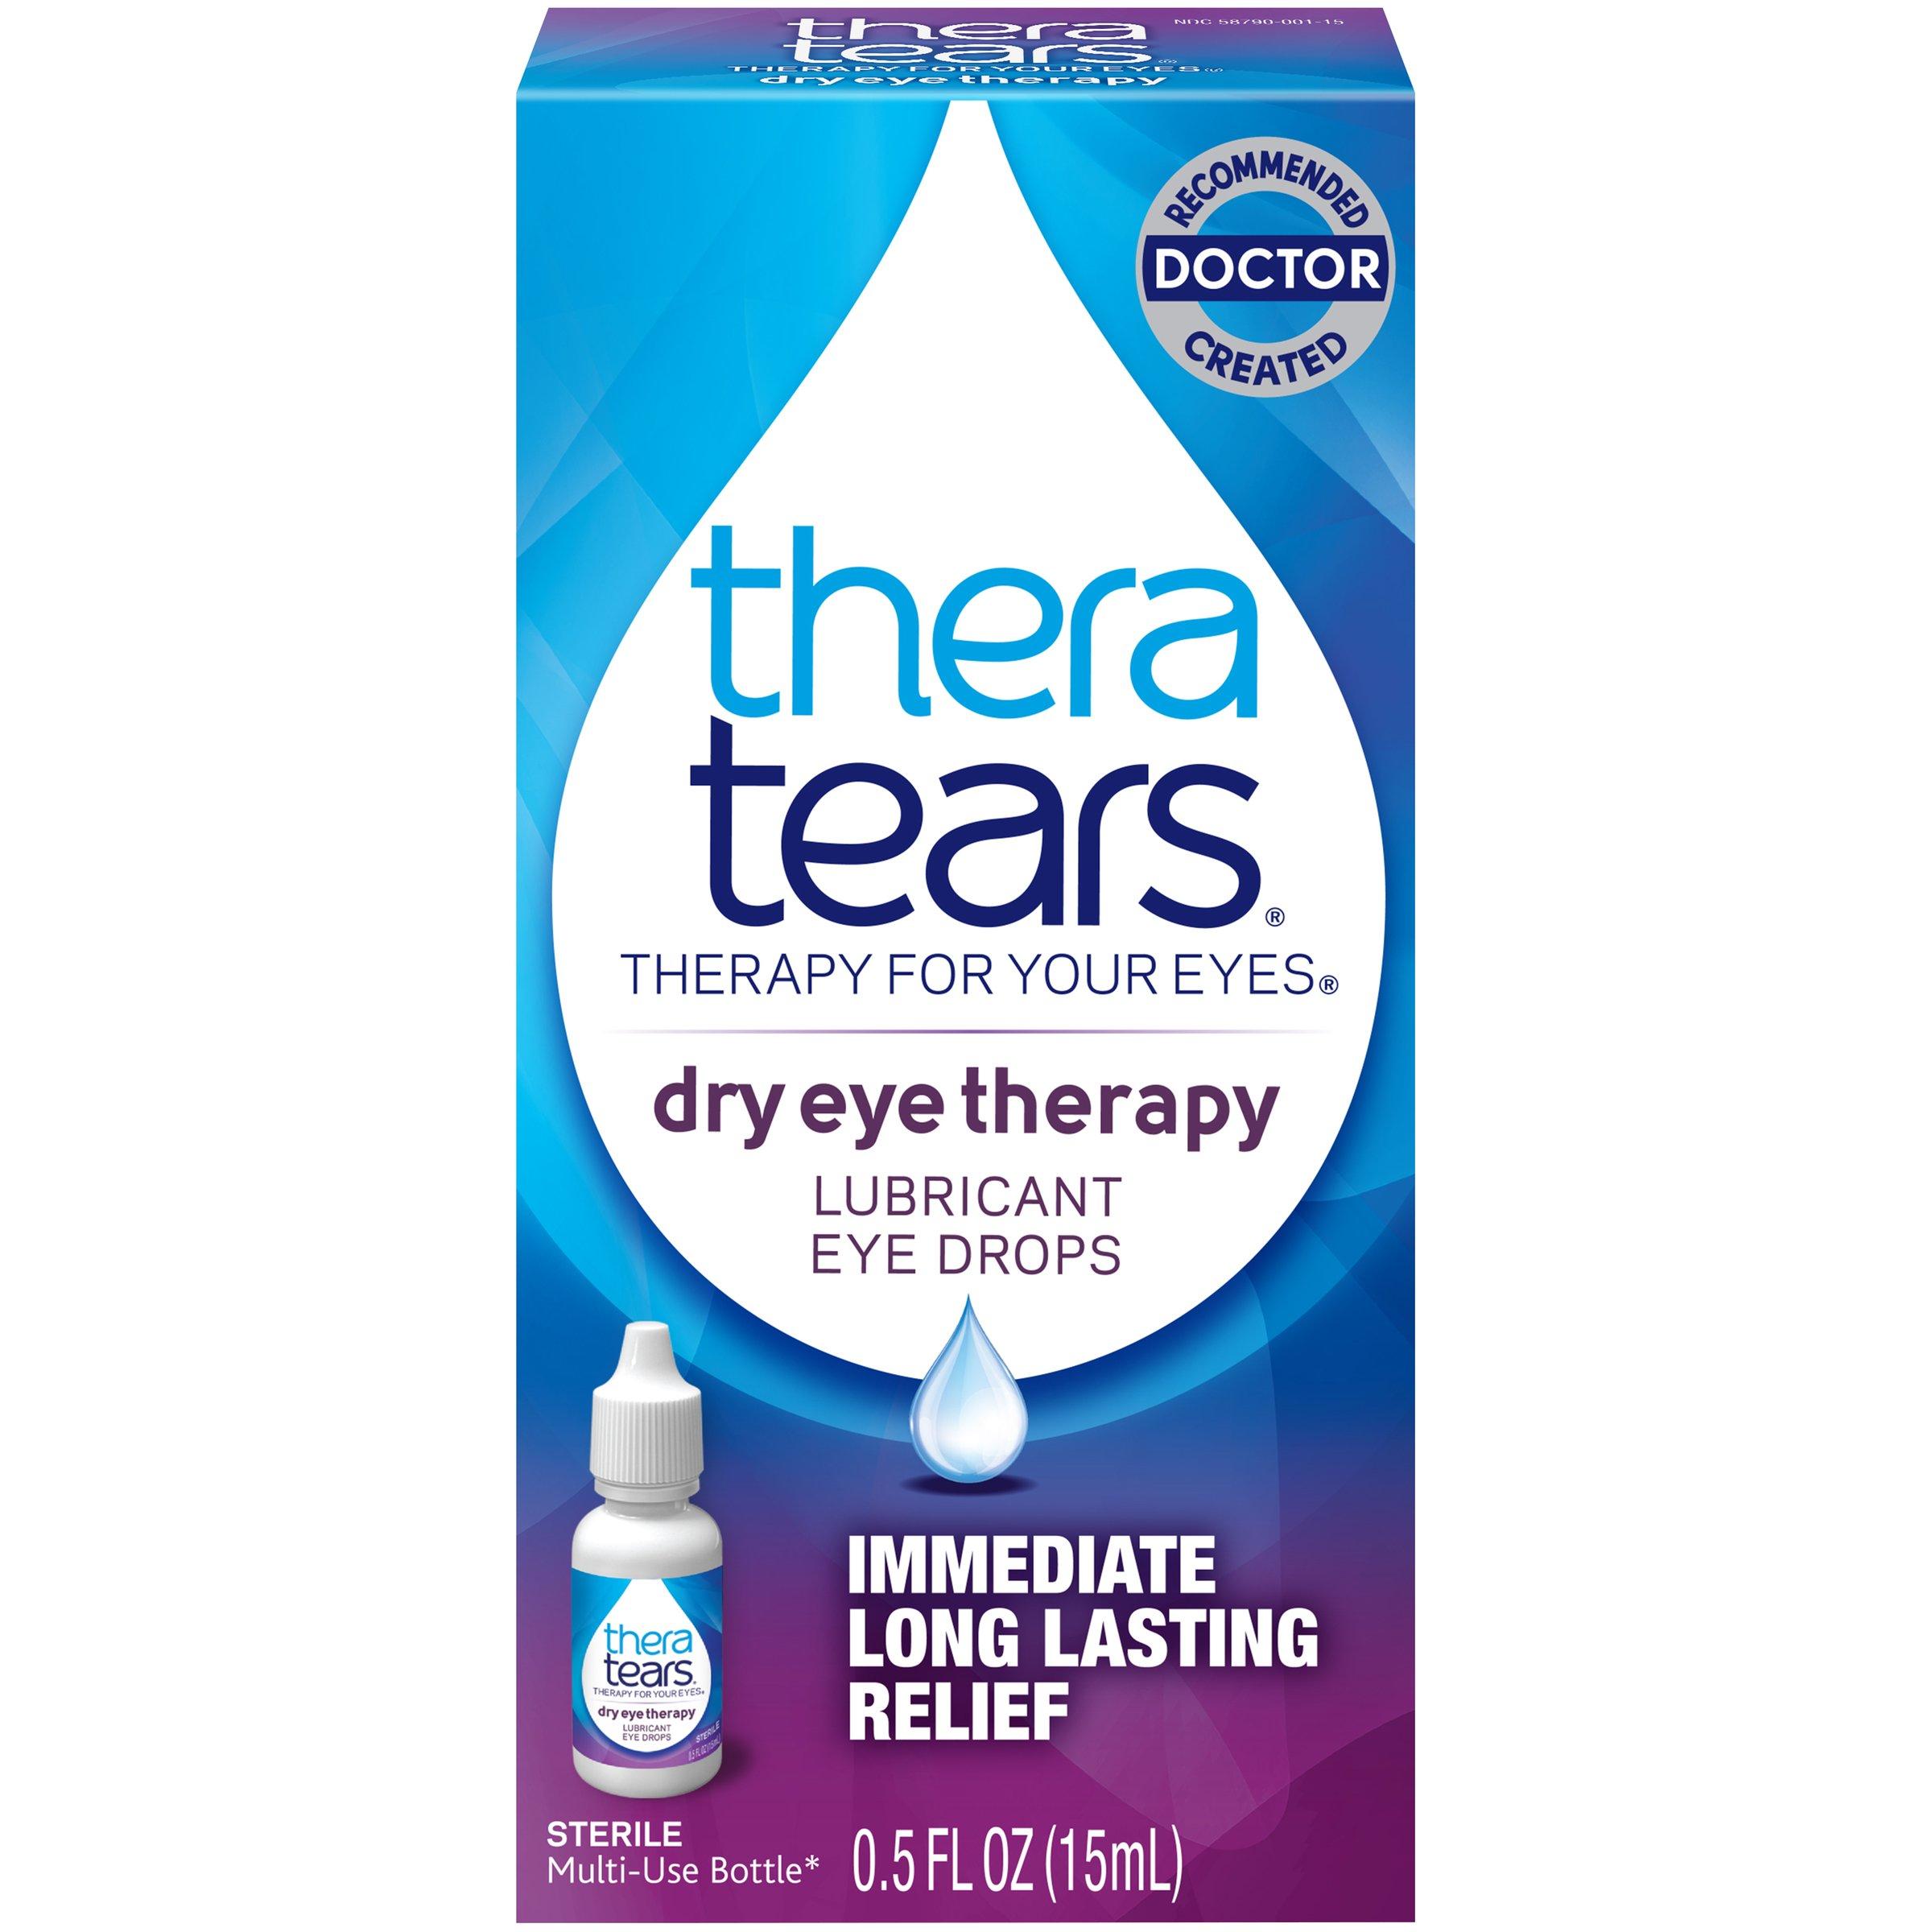 TheraTears Dry Eye Therapy- Lubricant Eye Drops- 0.5 FL OZ(15 mL)